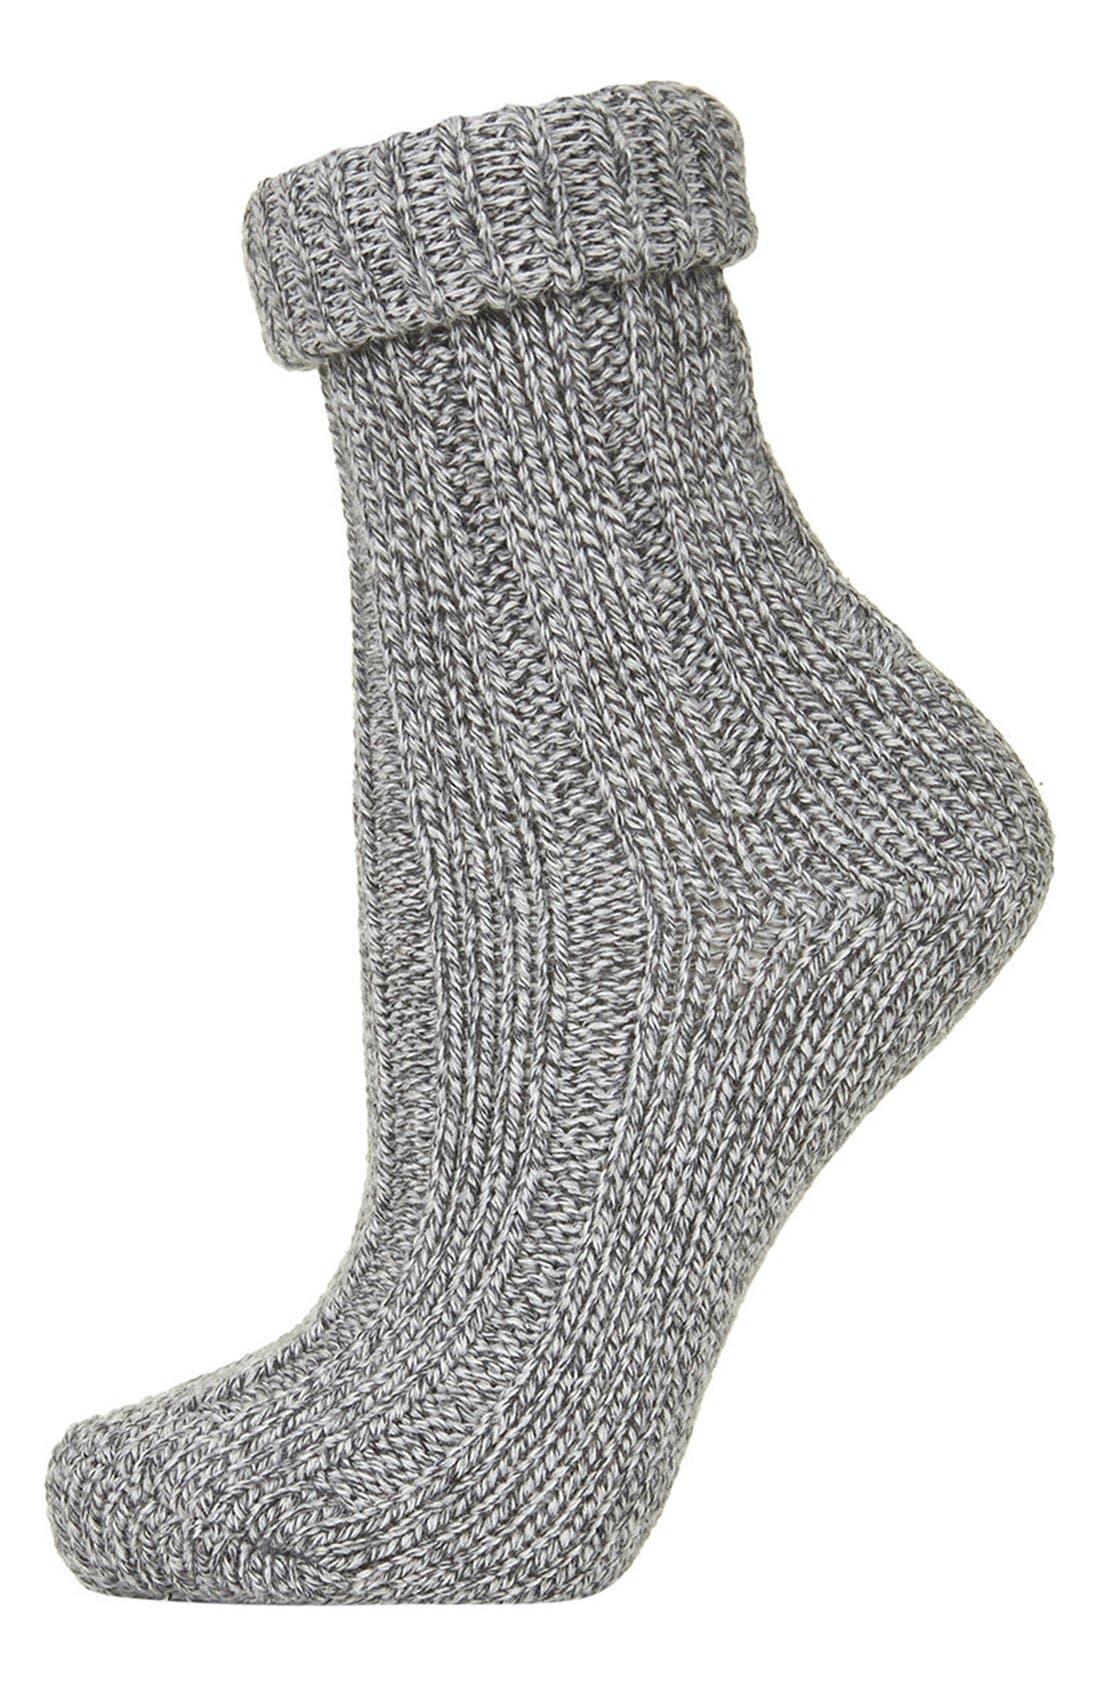 Alternate Image 1 Selected - Topshop Roll Top Knit Ankle Socks